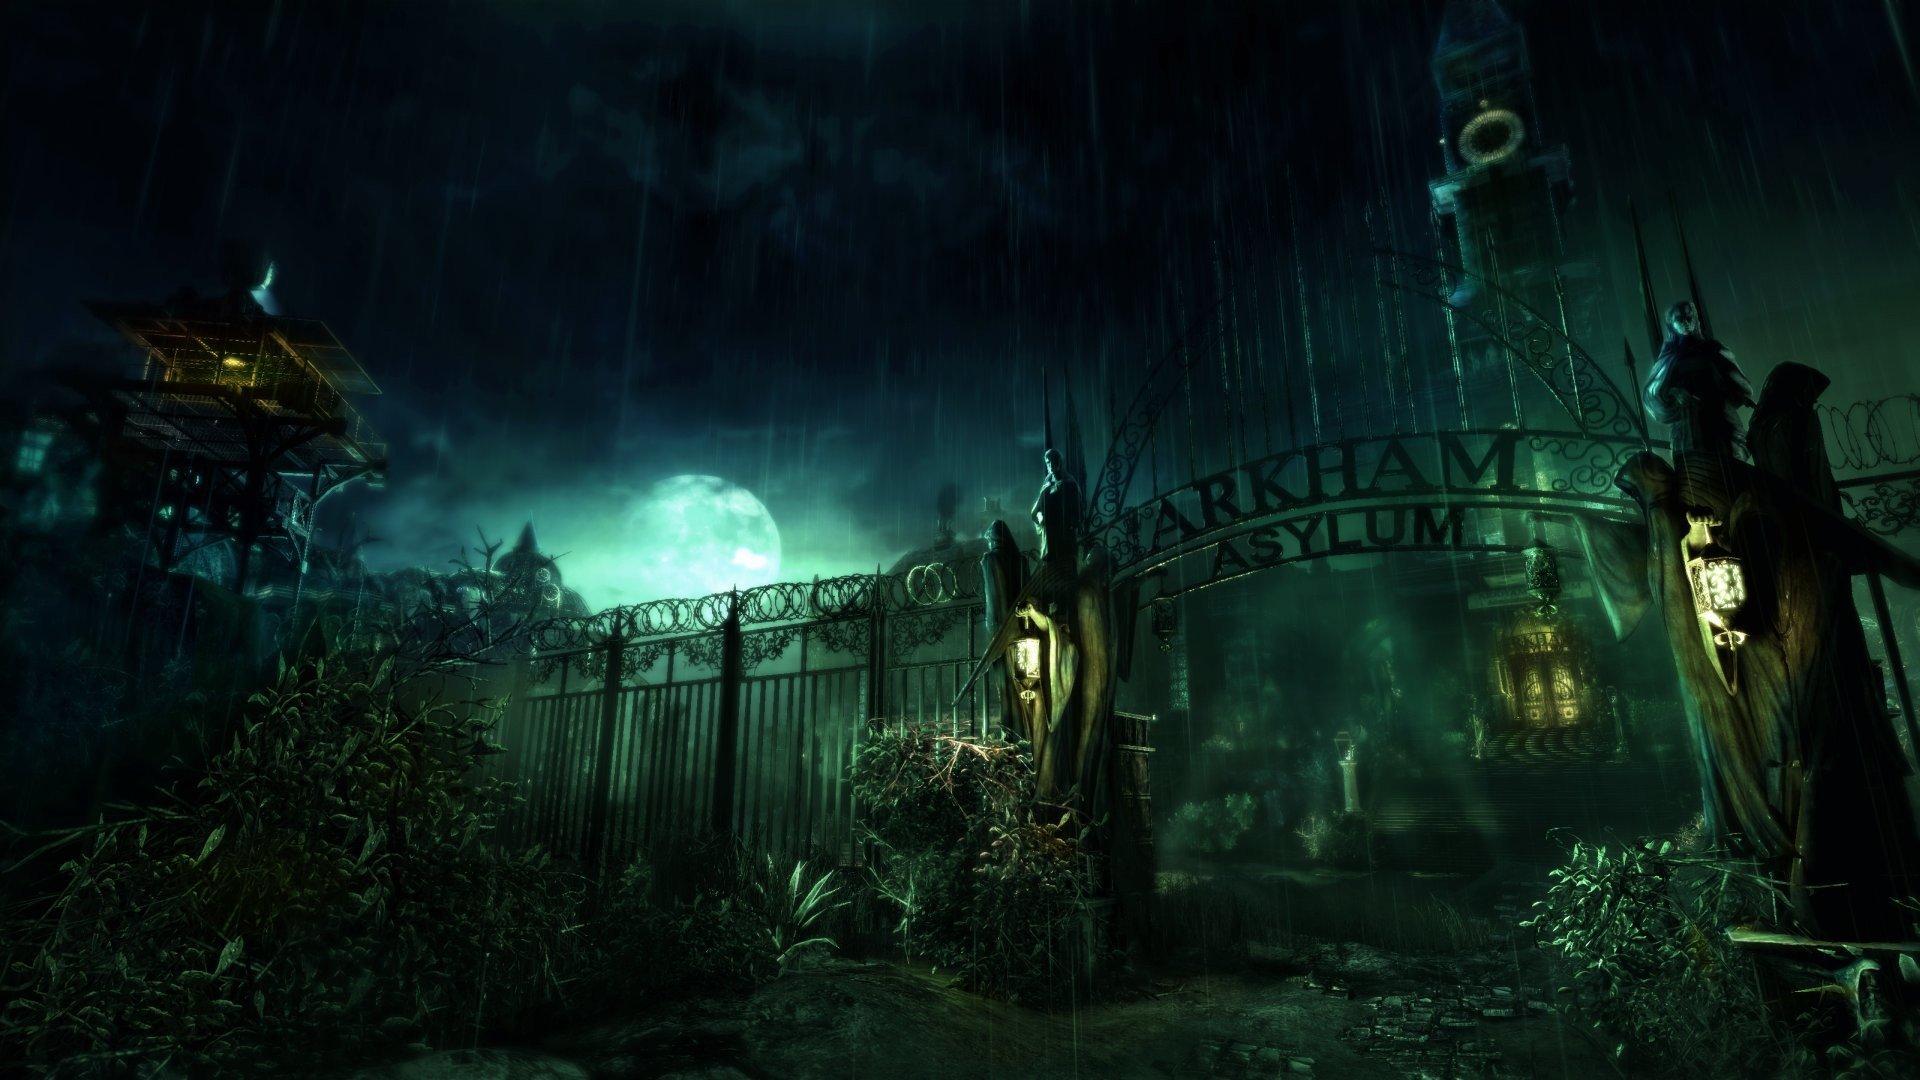 Batman Arkham Asylum Hd Wallpapers Desktop And Mobile Images